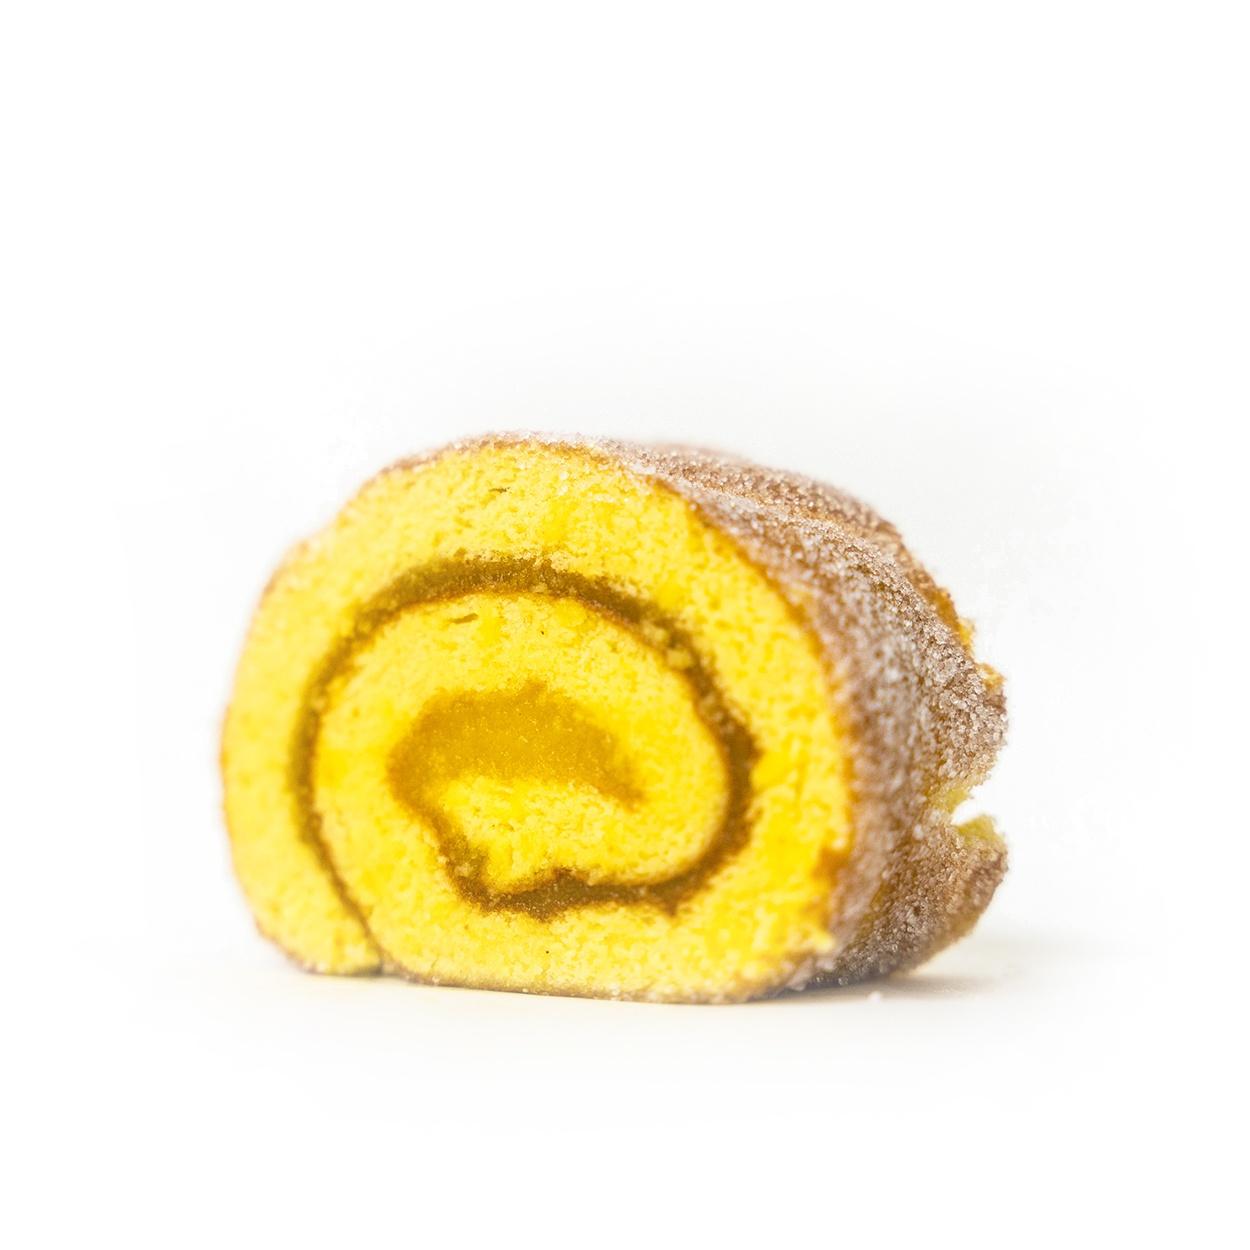 torta-ovo-pastelaria-fresca-entrega-casa-cale-confeitaria-tradicional-portuguesa-peniche-caldas-rainha-padaria-pastelaria